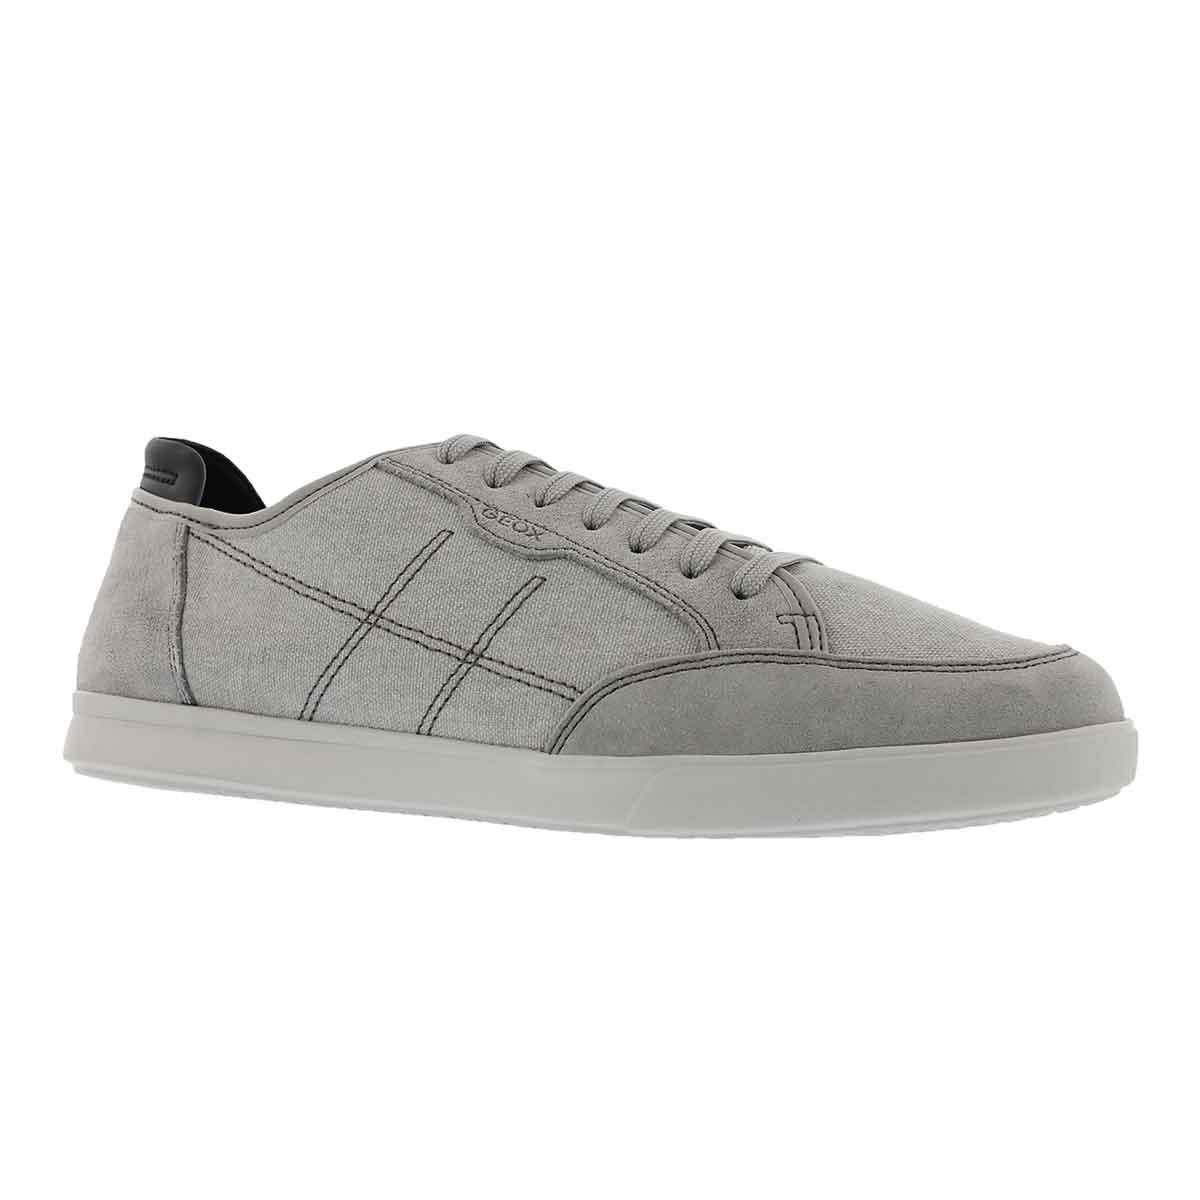 Men's WALEE light grey fashion sneakers